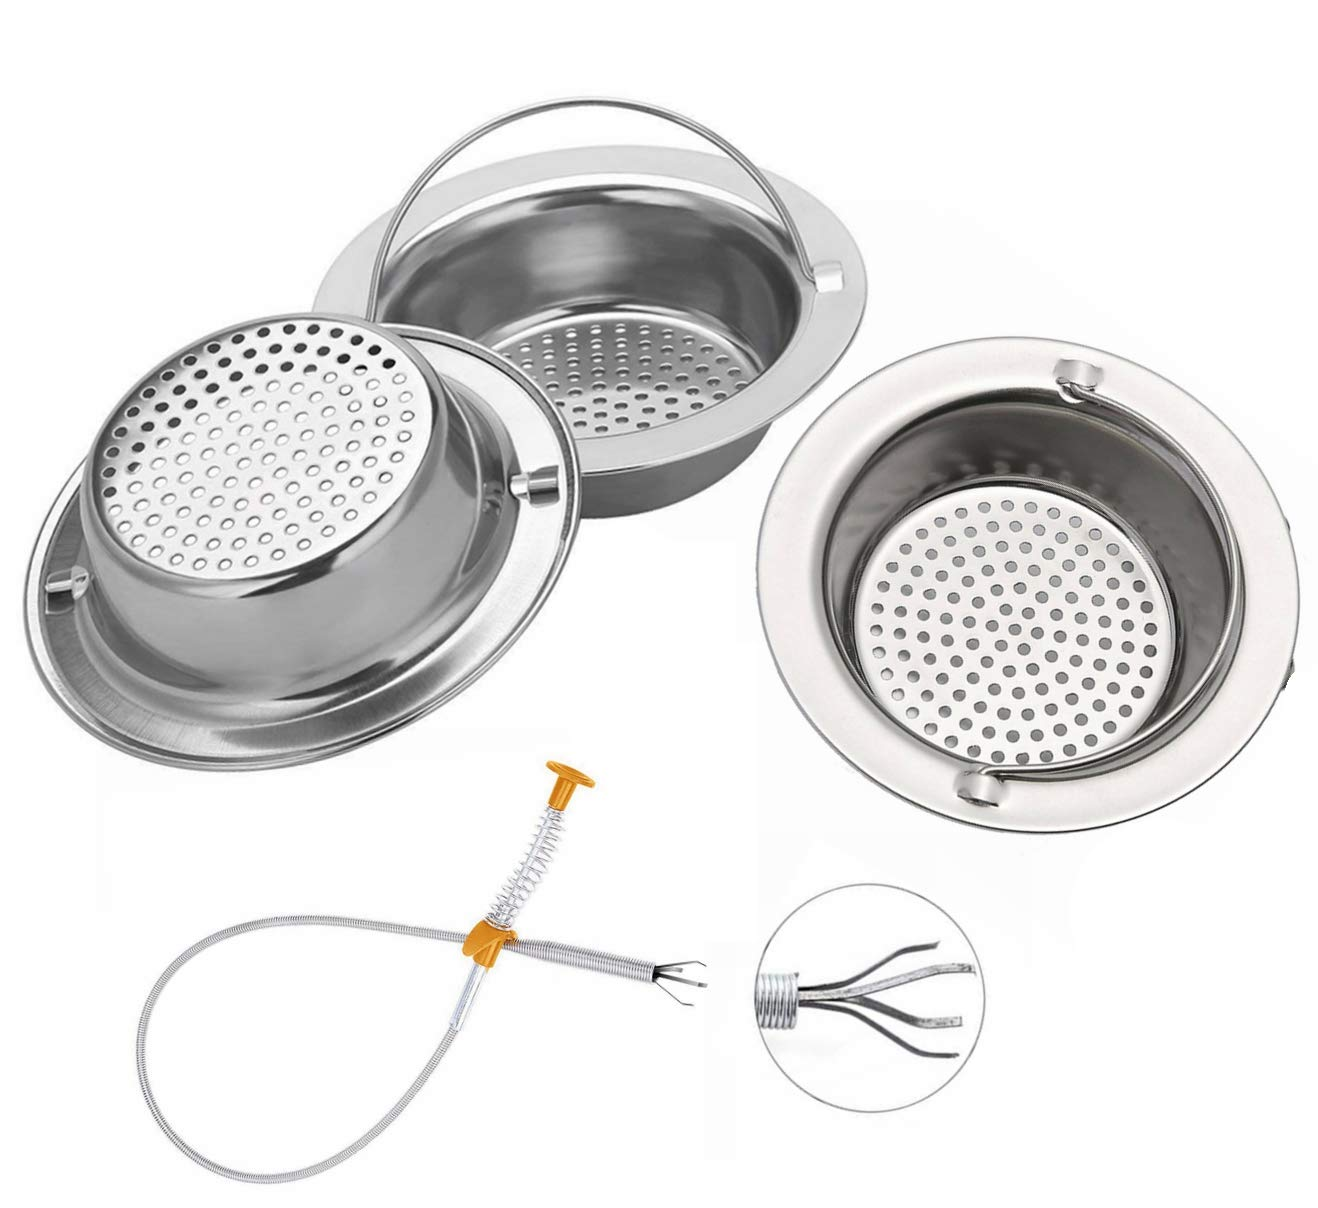 "4PCS Sink drain Strainer, Premium Stainless Steel Kitchen Sink Garbage Disposal Stopper Mesh Basket,Large Wide Diameter 4.33"", Handheld Trash Strainer,Food & Hair Catcher Colander"